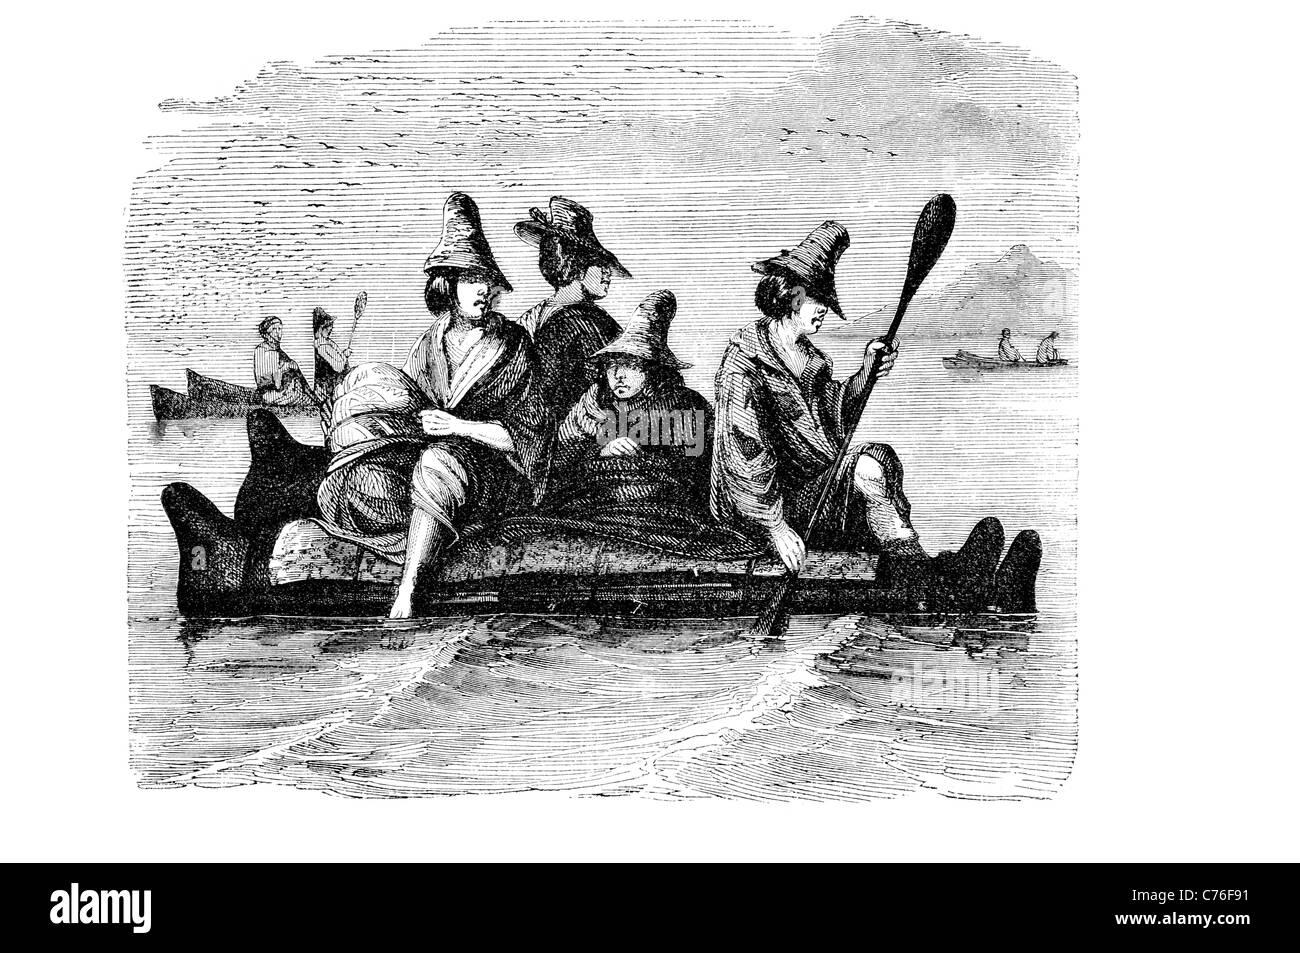 Balsa boat ship pre Columbian South American civilization woven reeds reed Totora bullrush canoe fishing boats ships - Stock Image